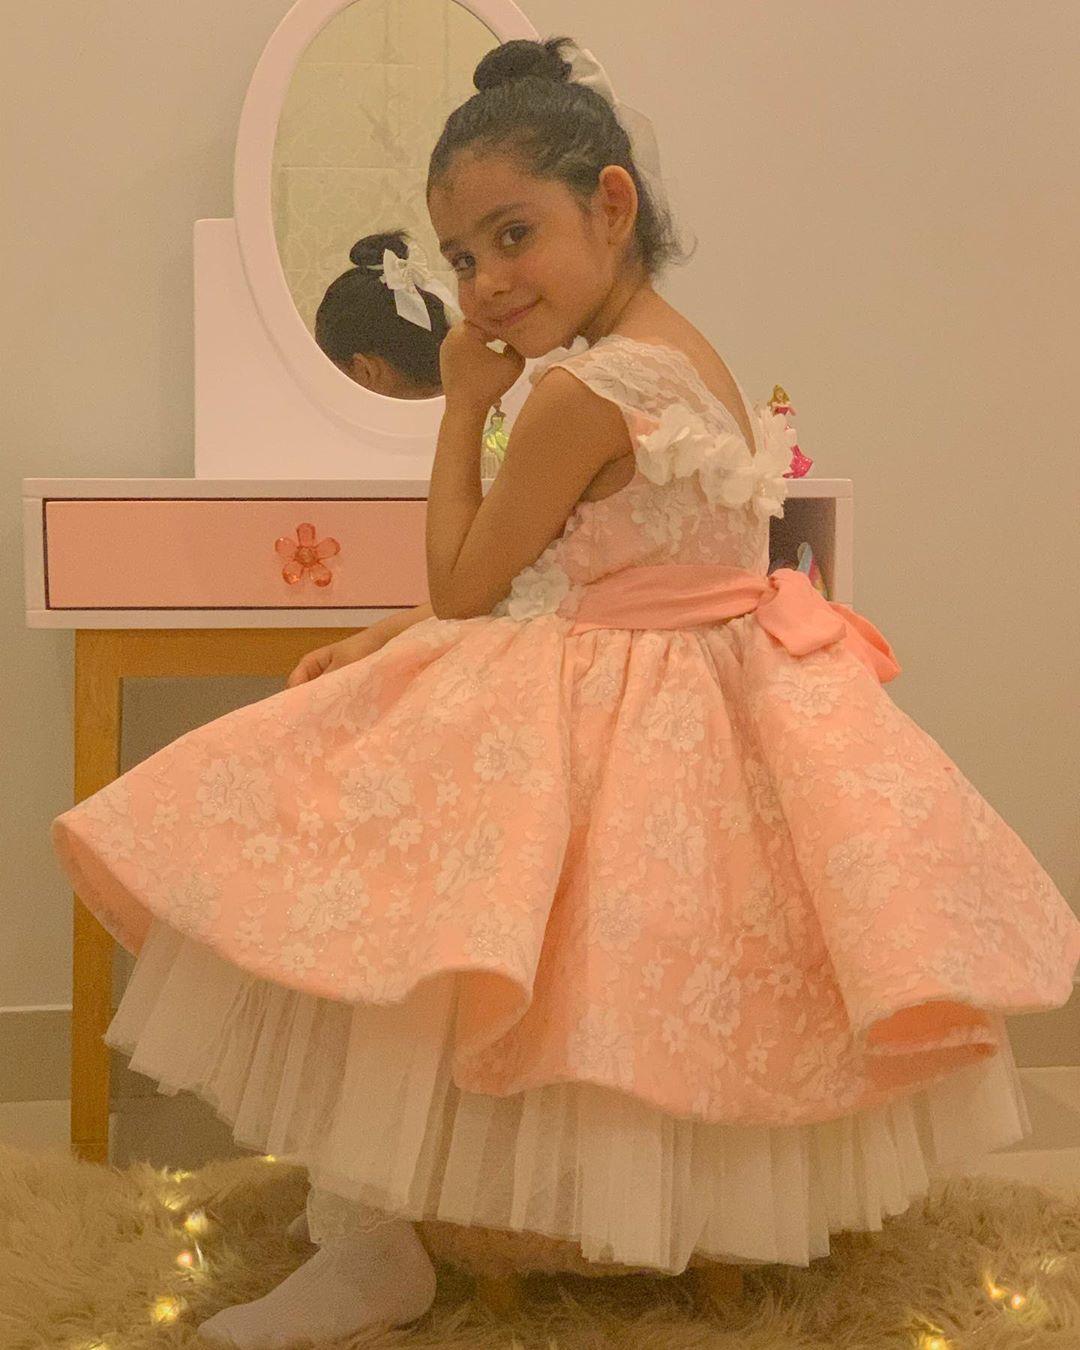 Ayeza and Danish Celebrating their Daughter Hoorain's 5th Birthday - Pictures